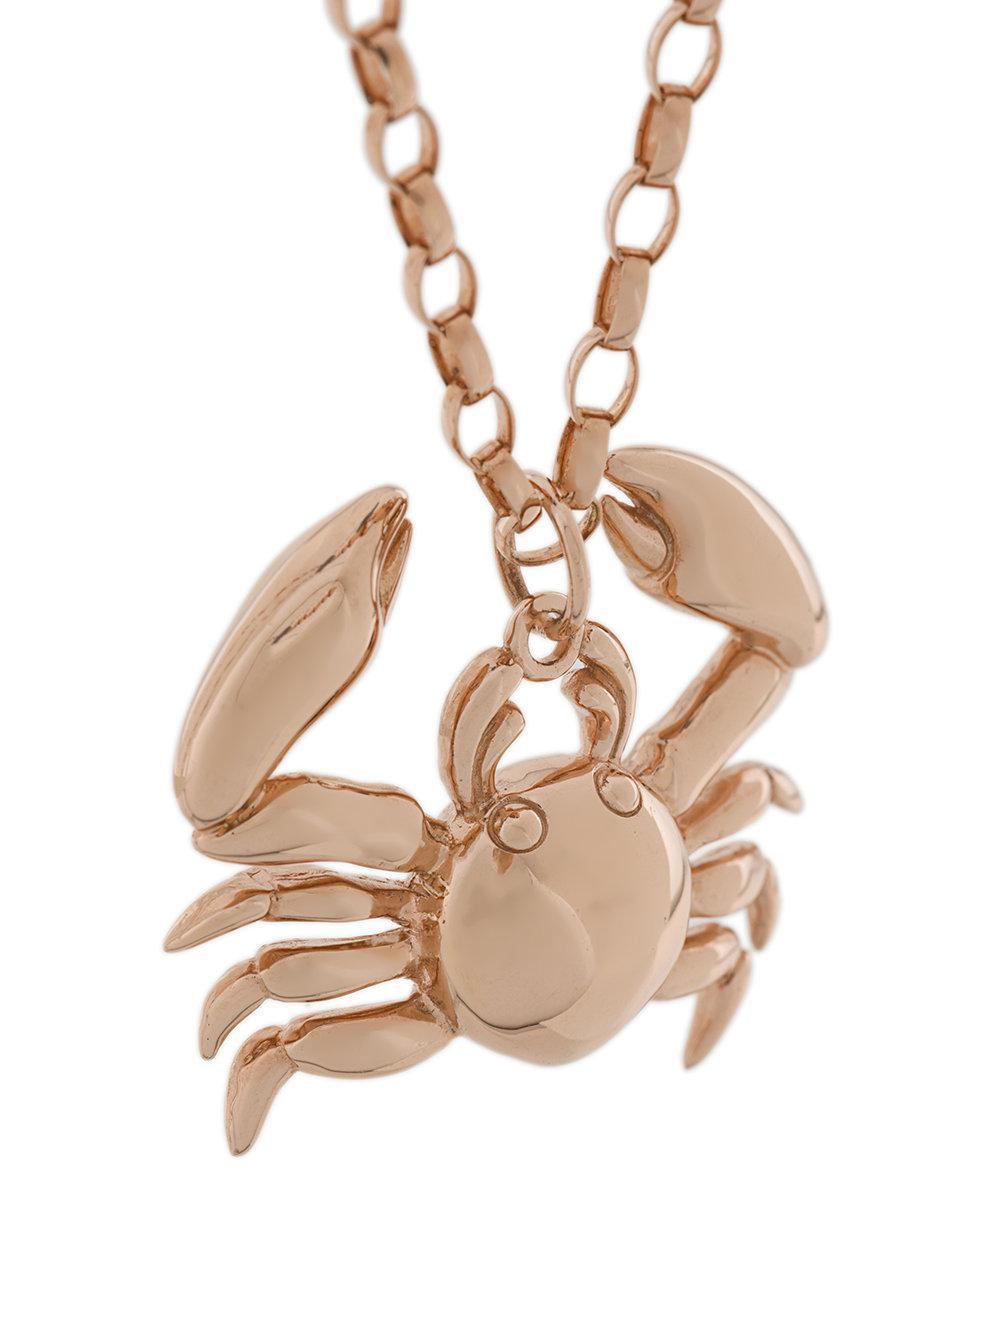 True Rocks Crab Pendant Necklace in Metallic